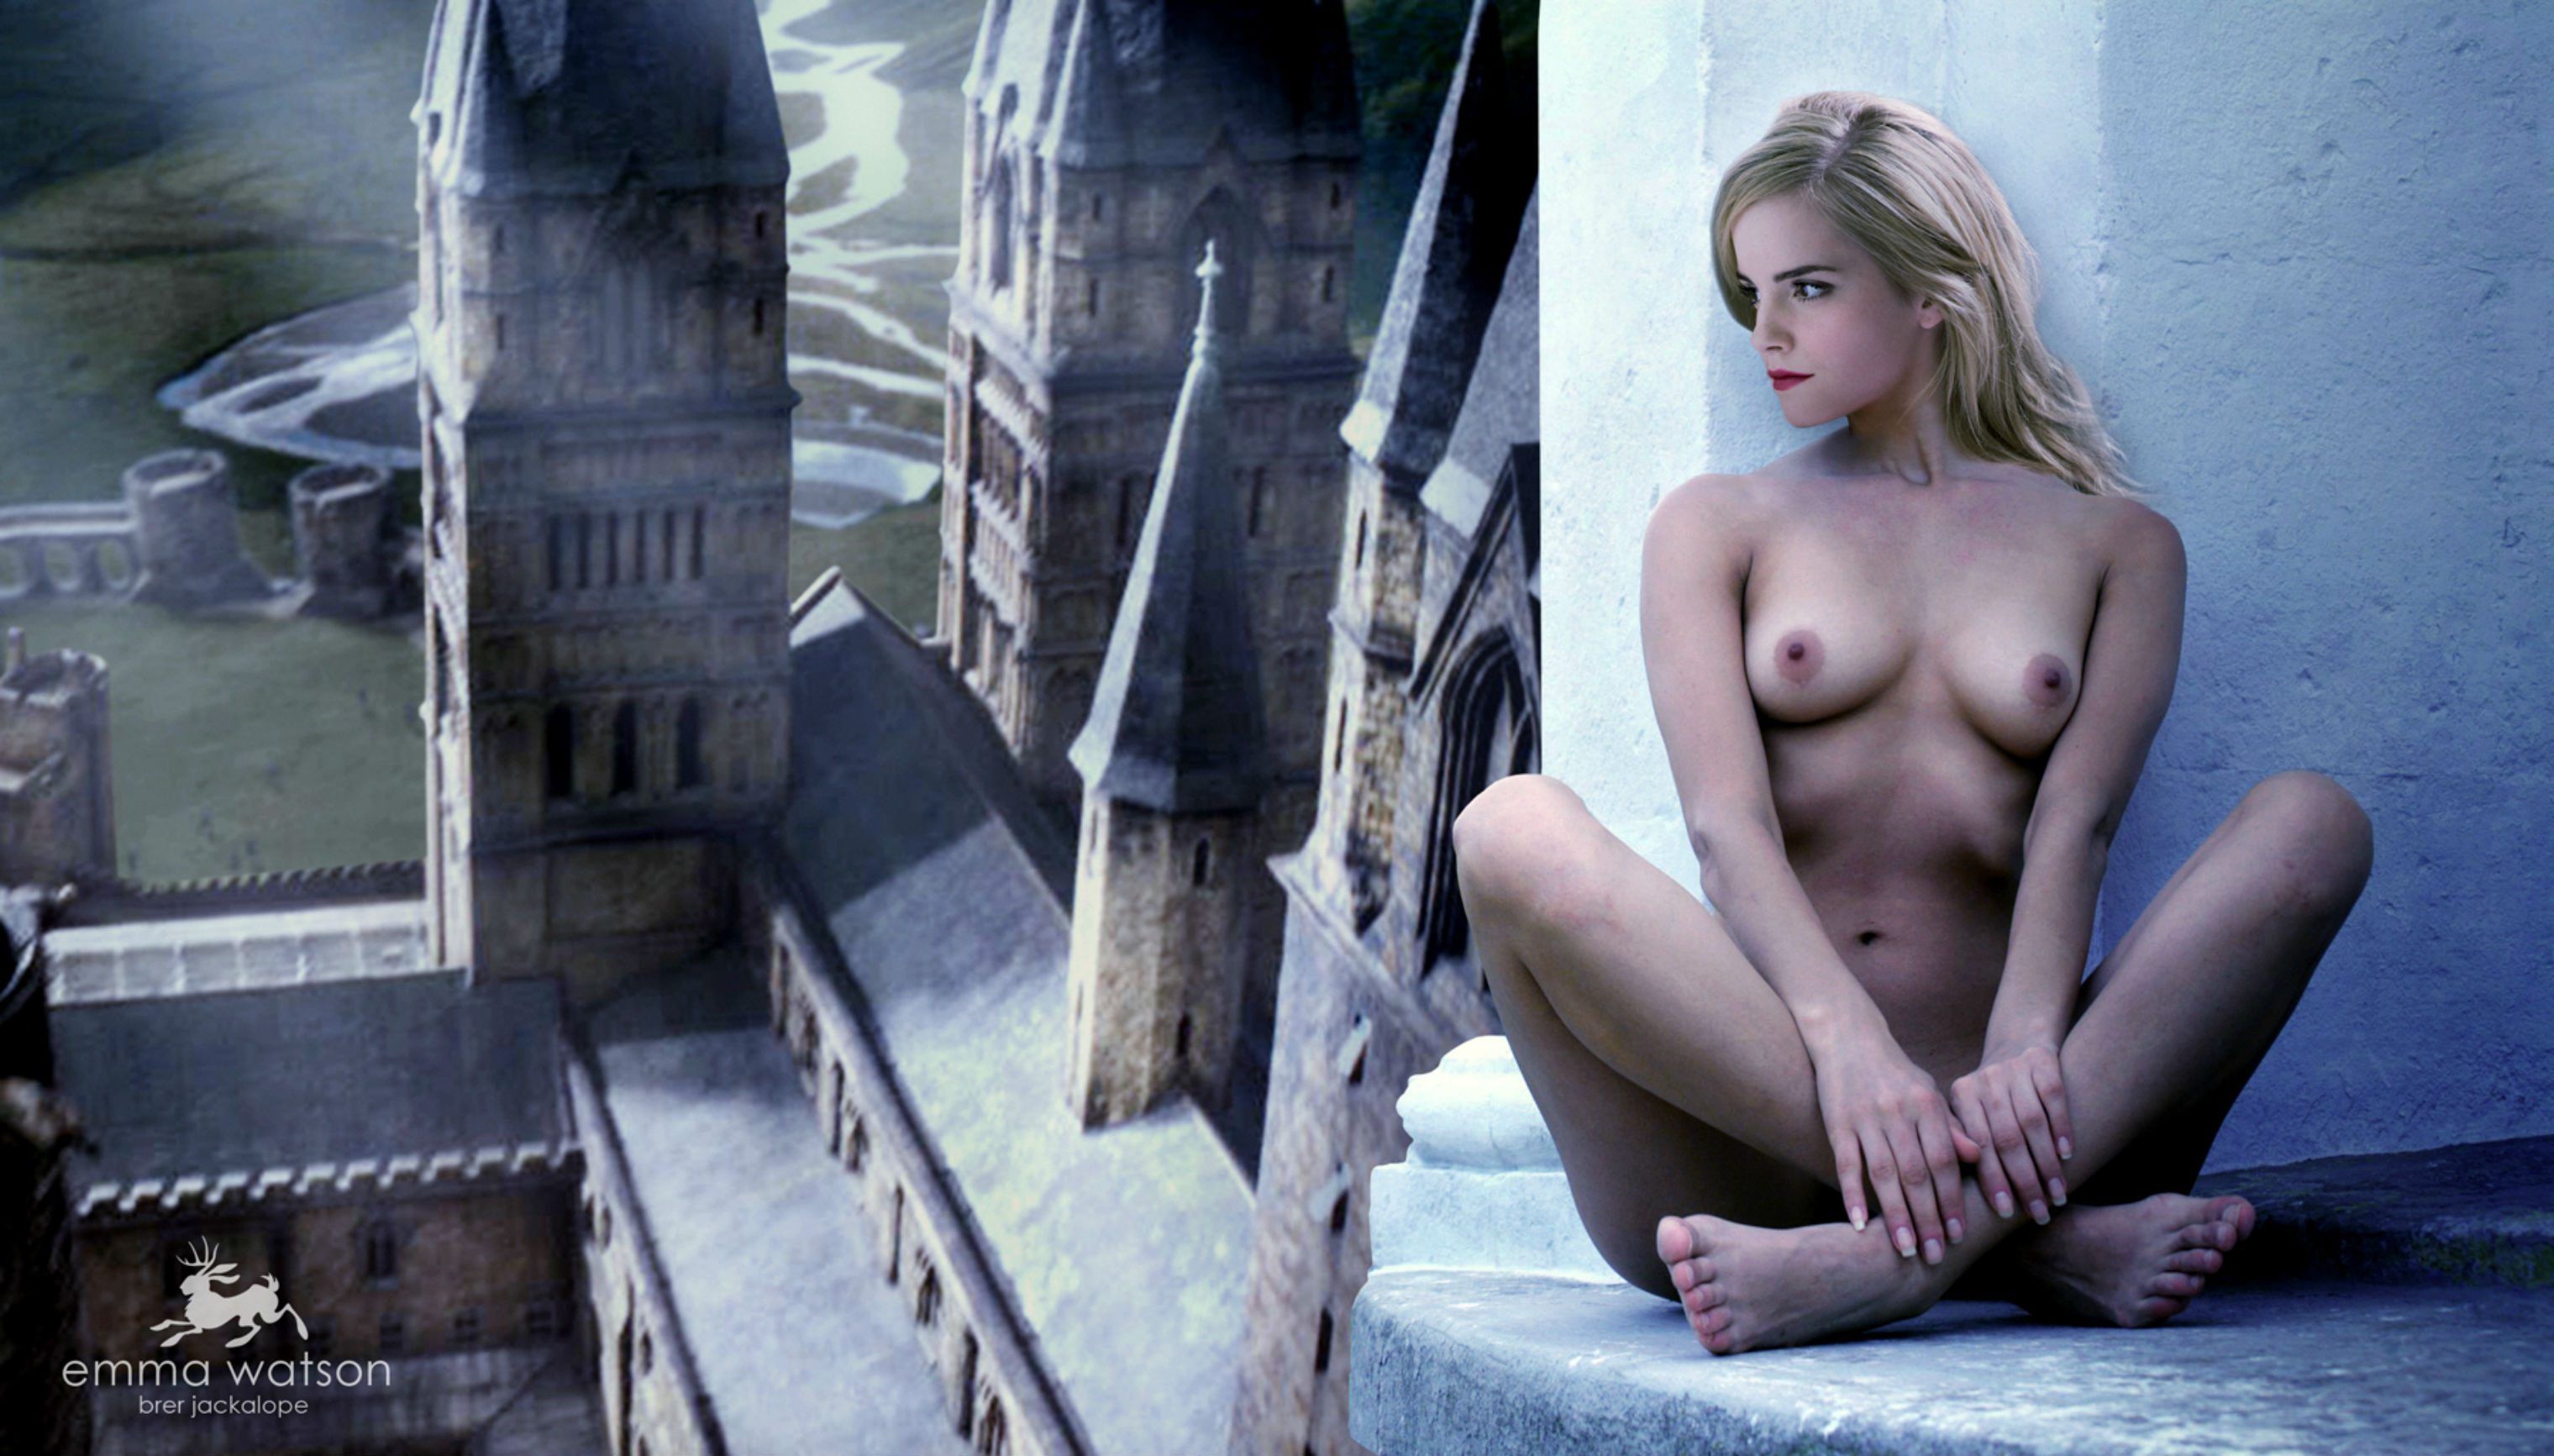 Wallpaper Fake, Actress, Emma Watson, Nude, Boobs, Legs -6834